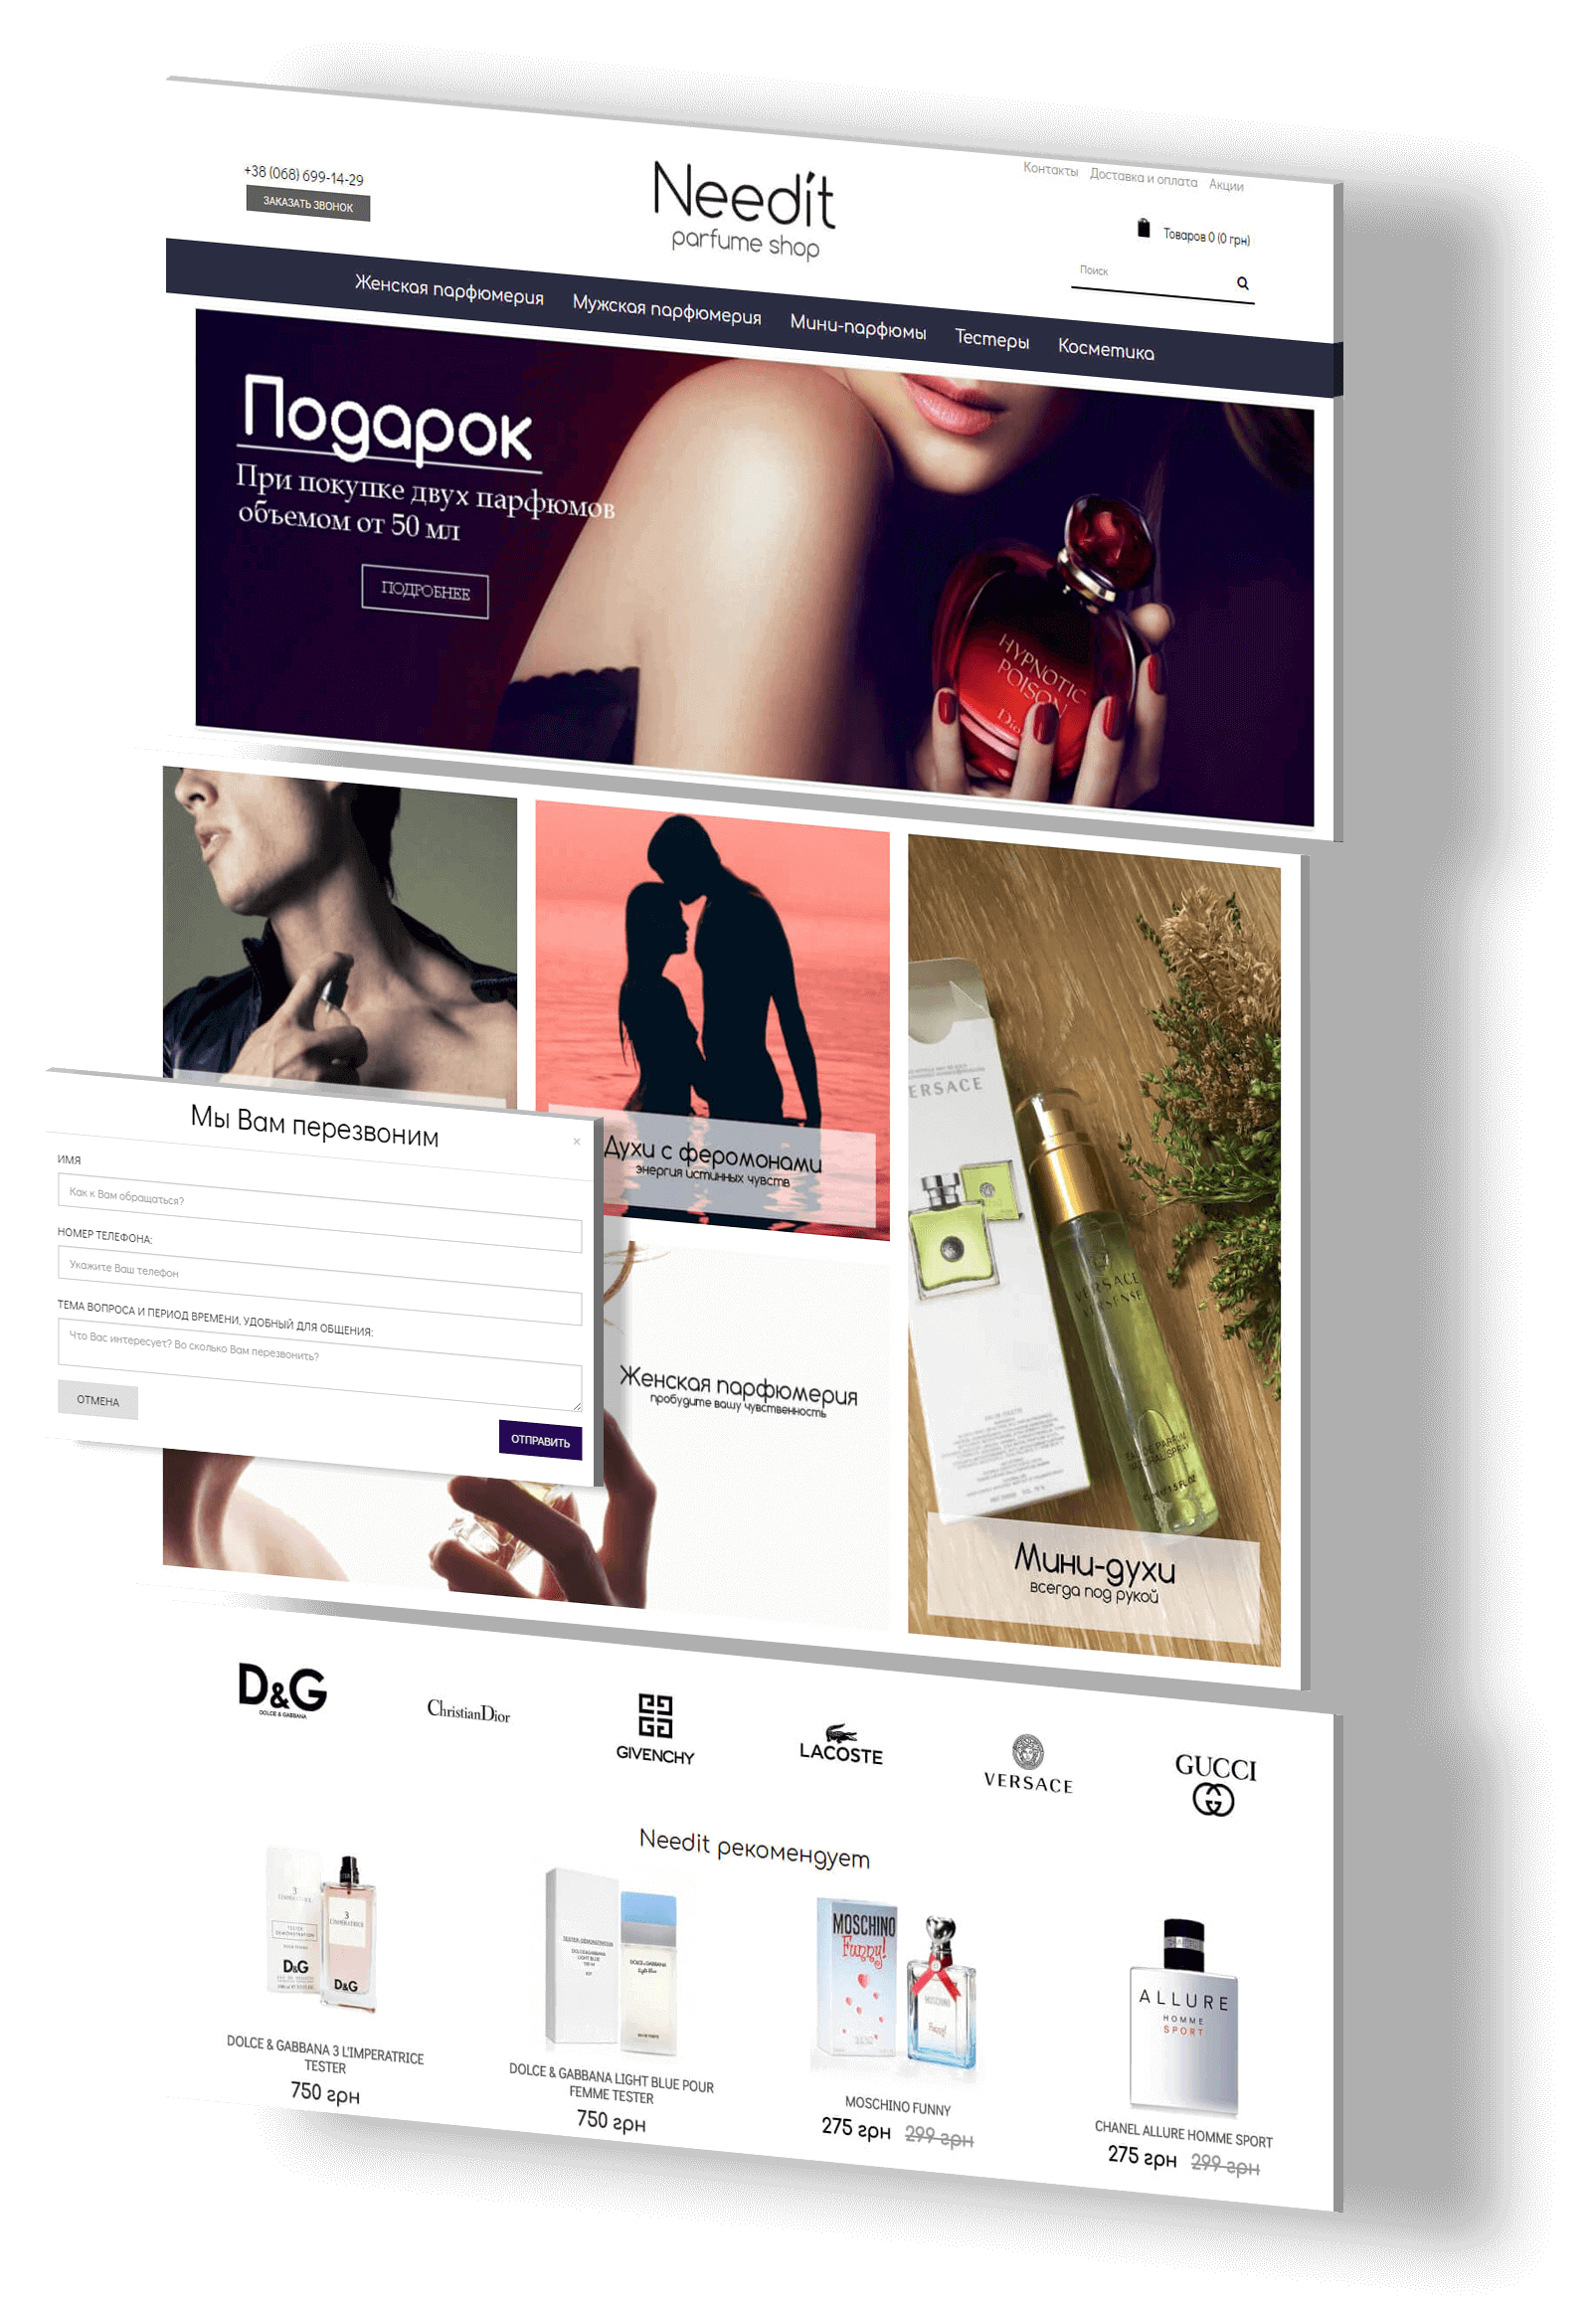 806f68119 ᐈ Создать сайт визитку для компании: ✅ Разработка корпоративного ...